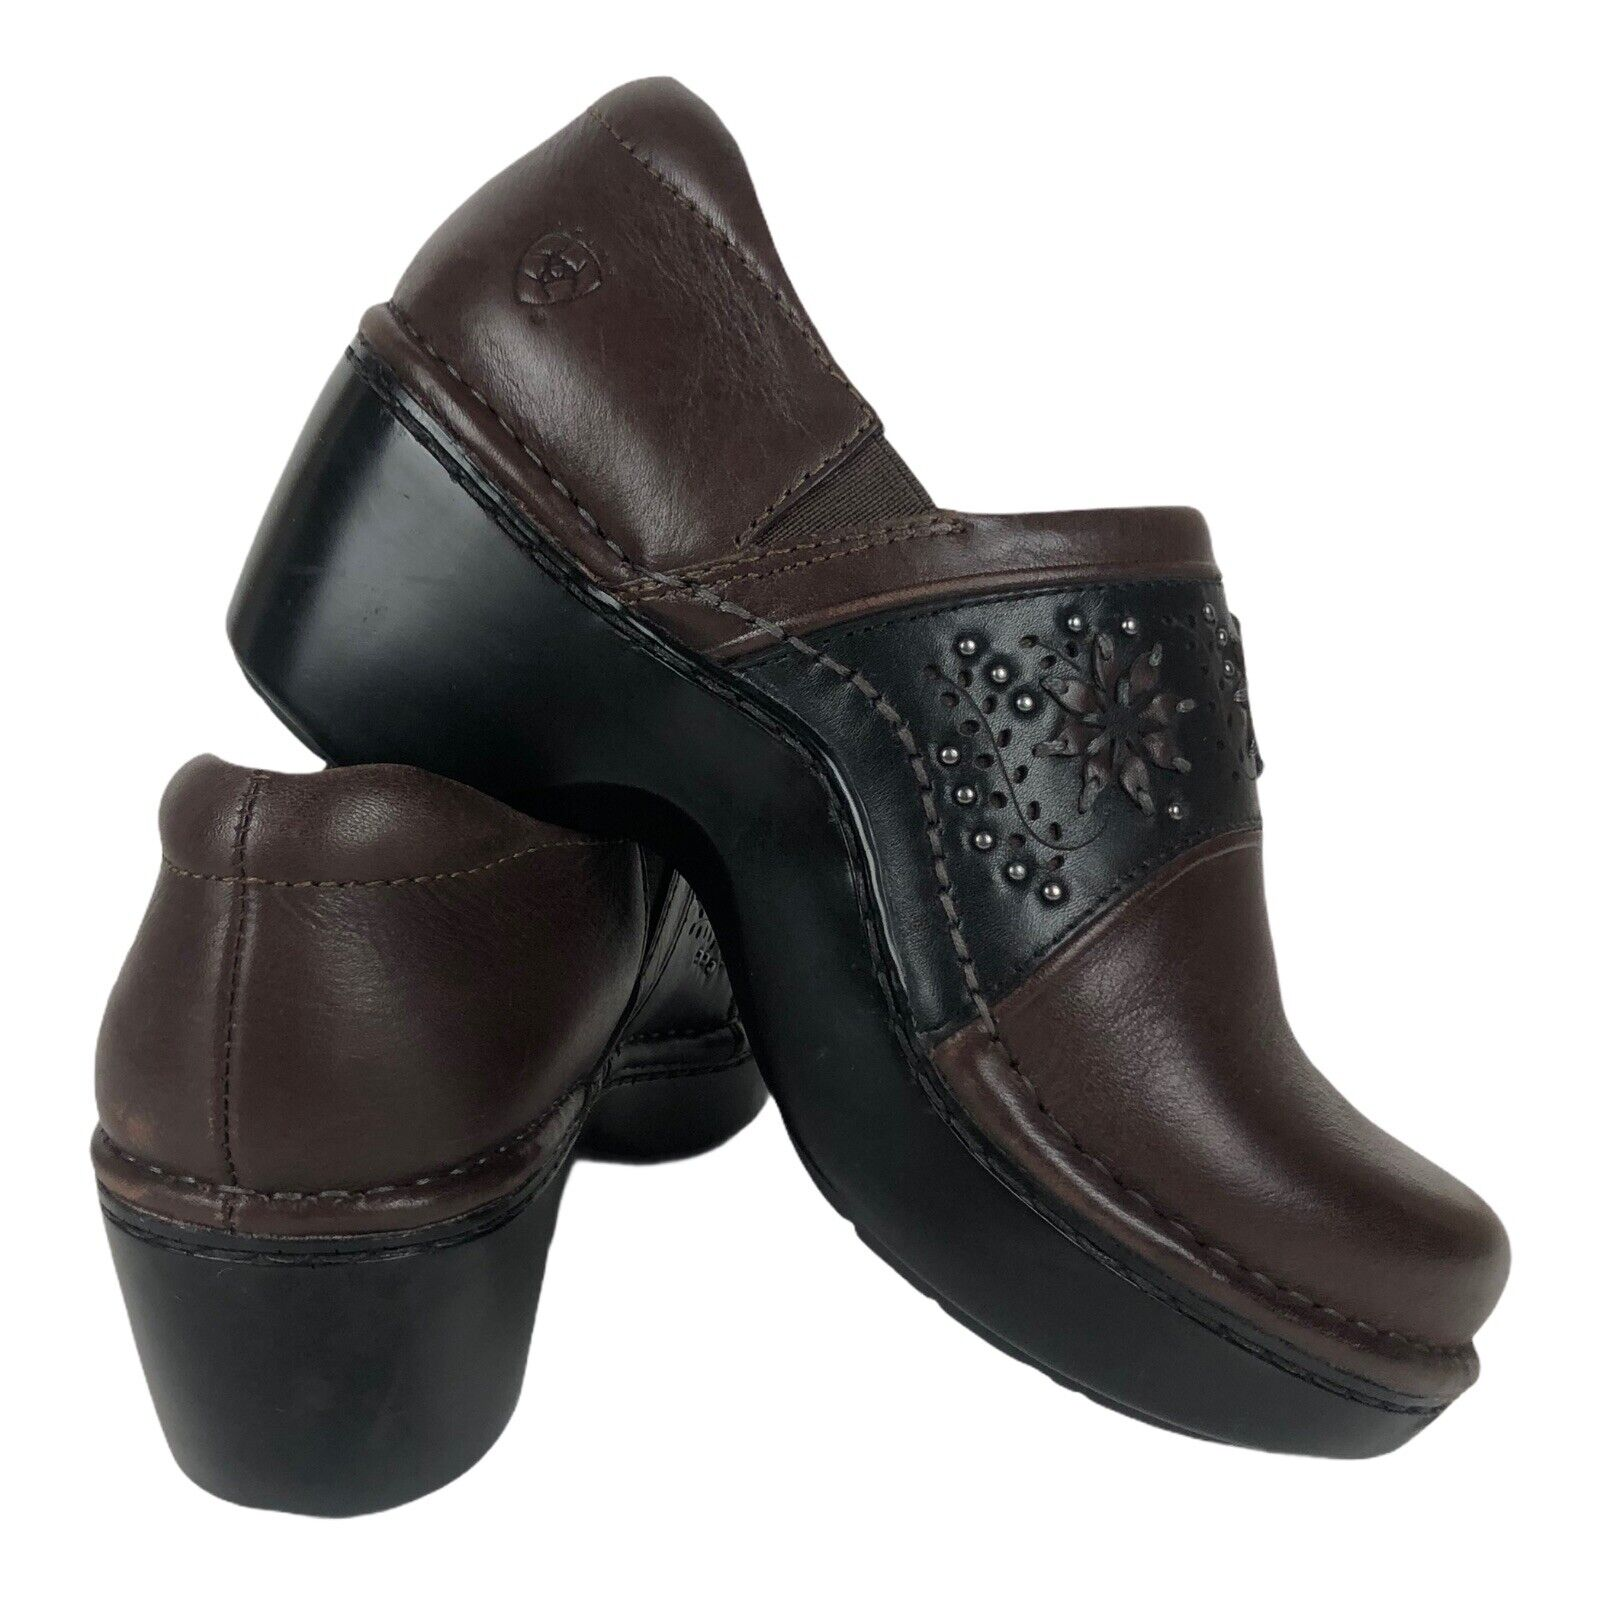 Ariat Black Leather Cutout Studded Tambour Comfort Slip On Clogs Mules Sz 5.5 B